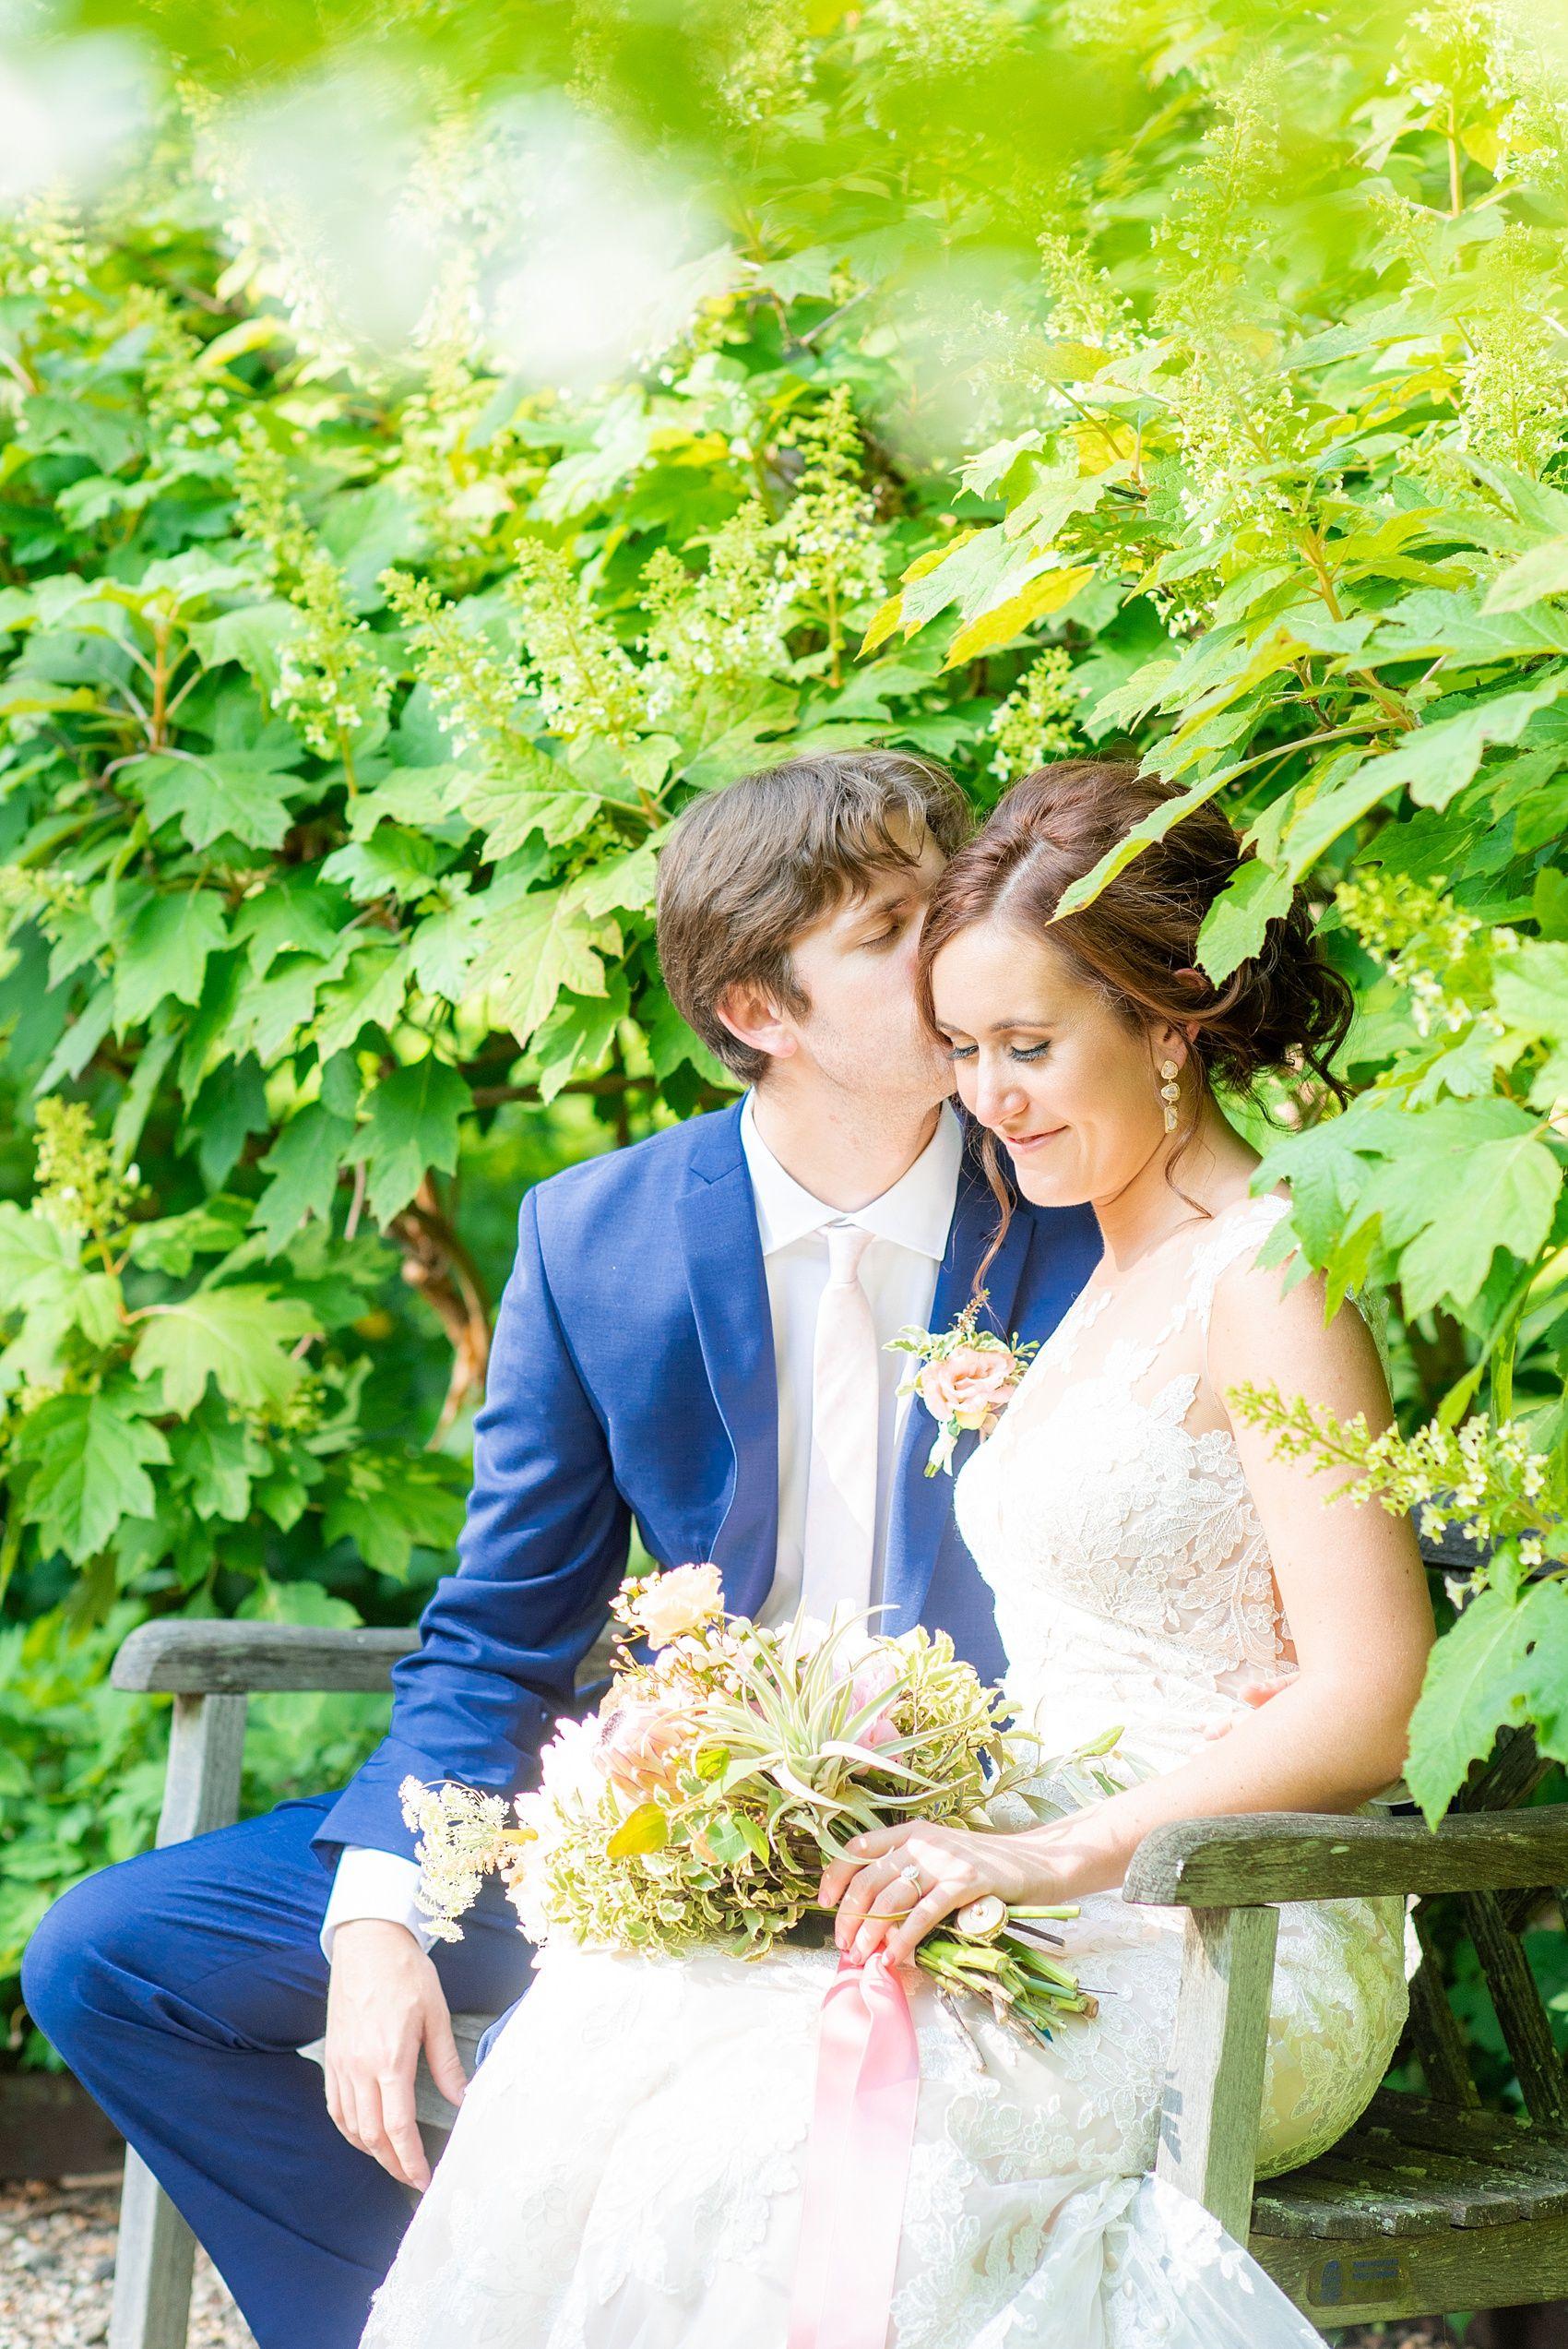 Olde Mill Inn and Cross Estate Gardens wedding photos in